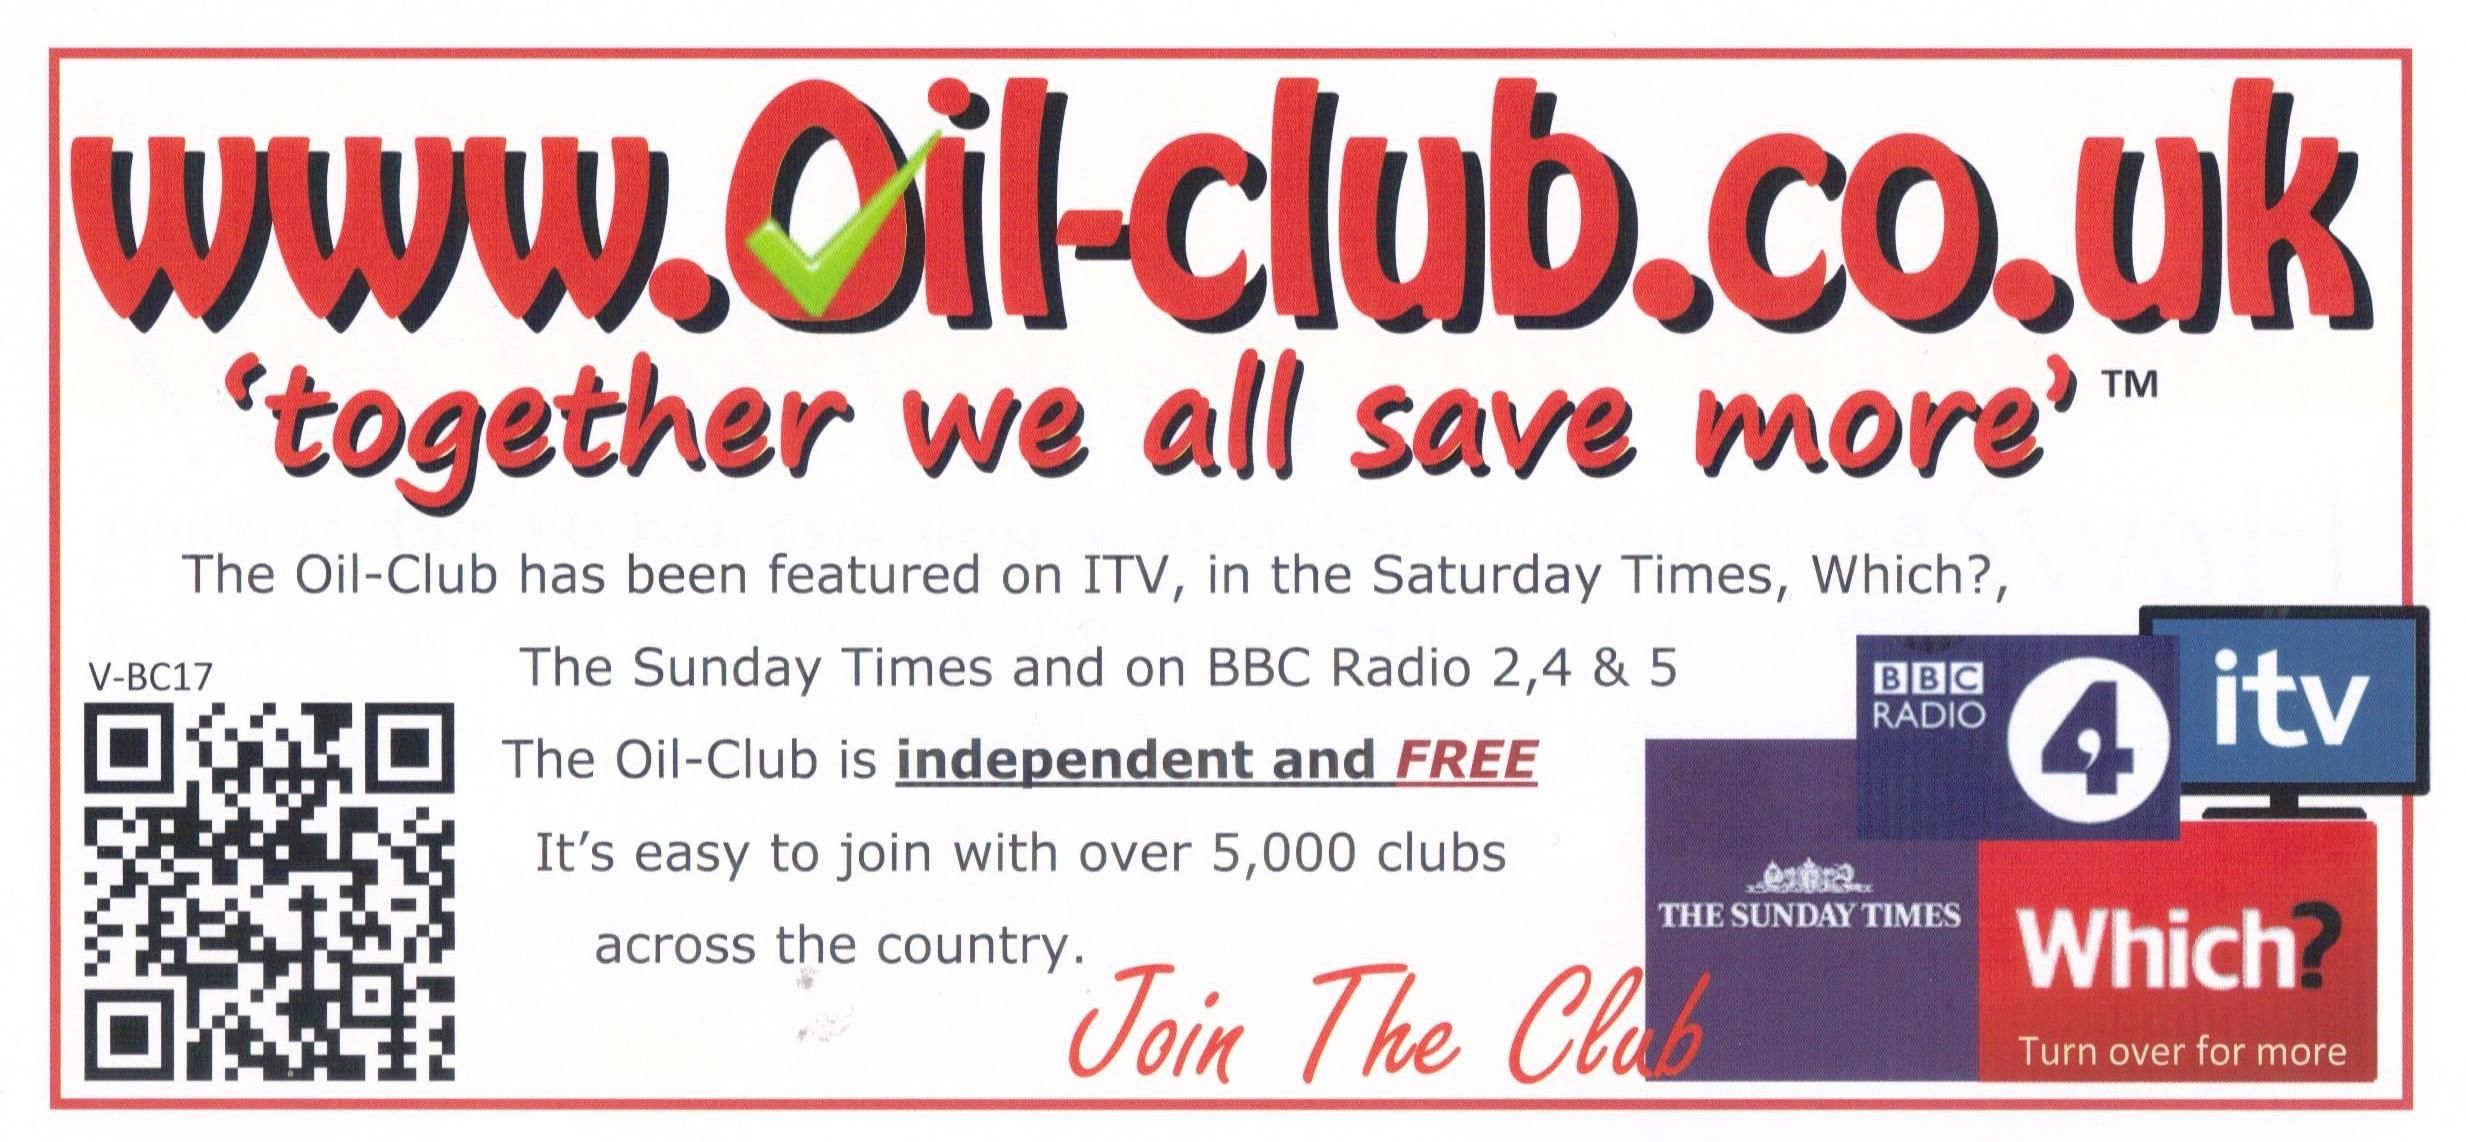 Oil_Club_001.jpg